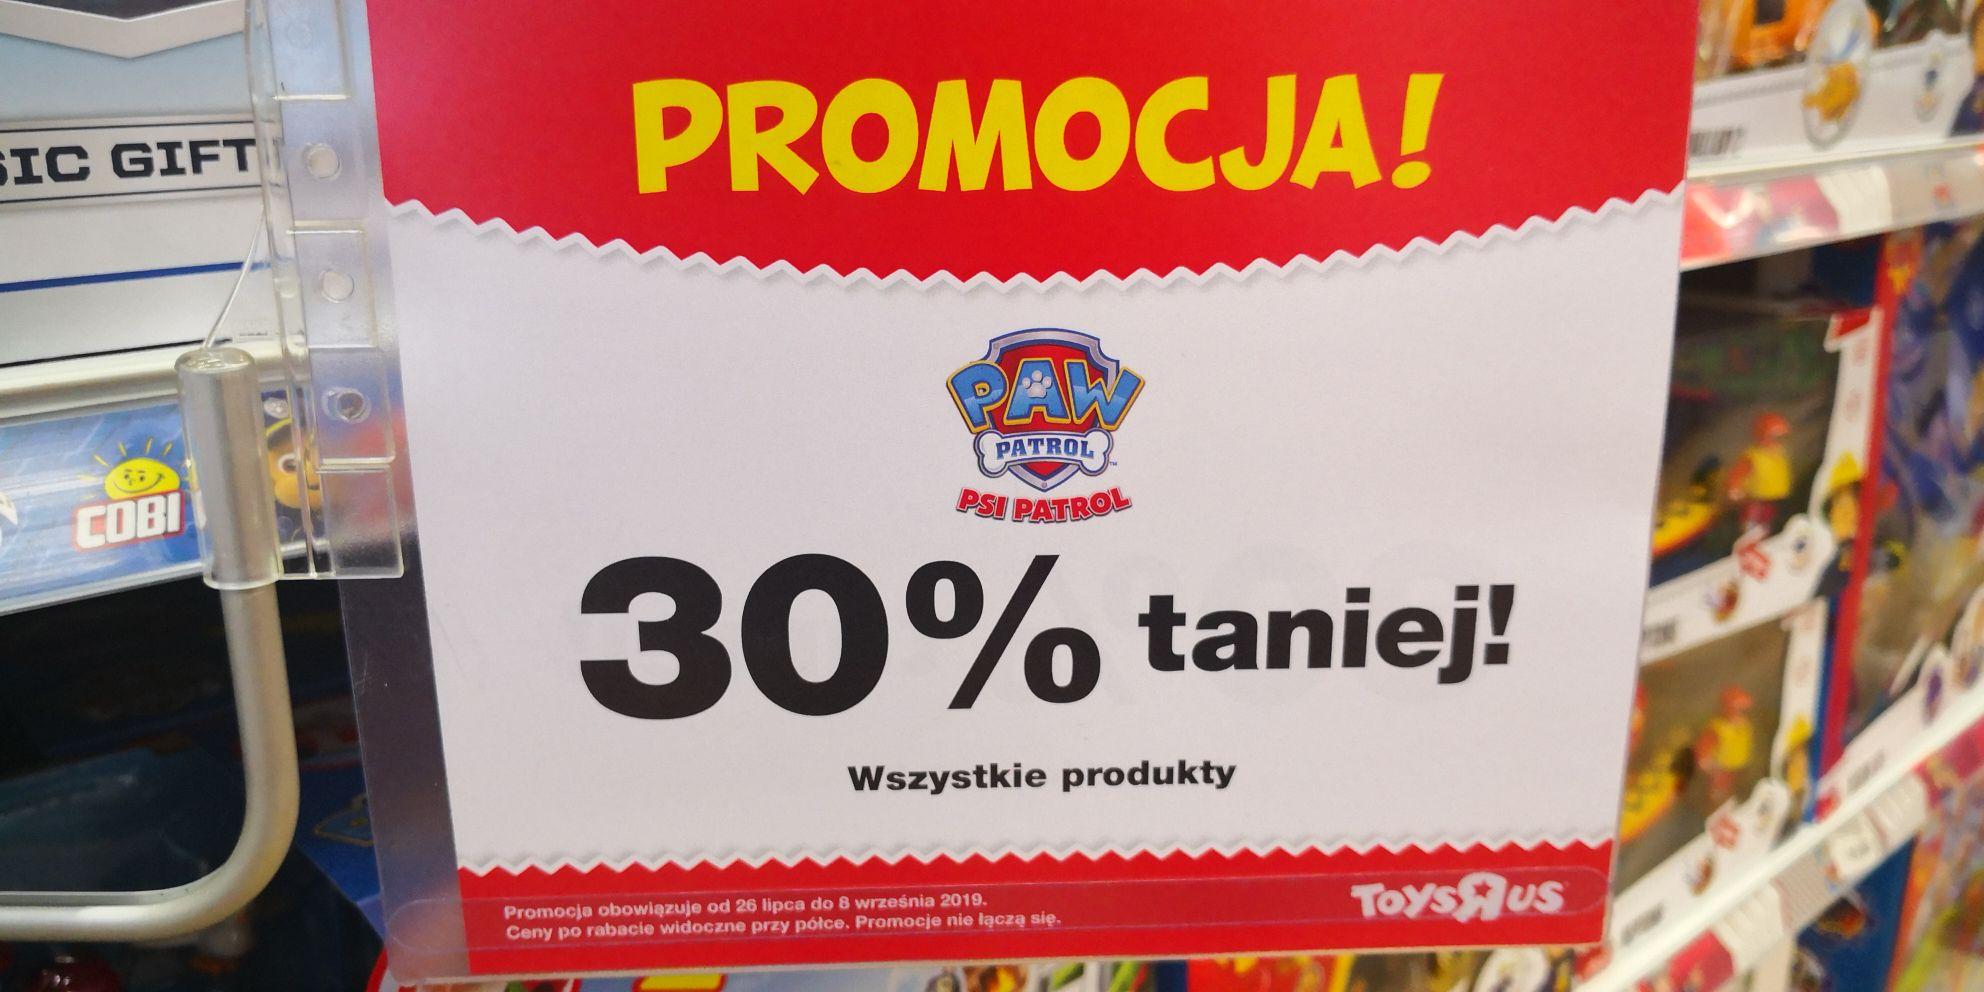 Toys R Us Psi patrol 30% taniej